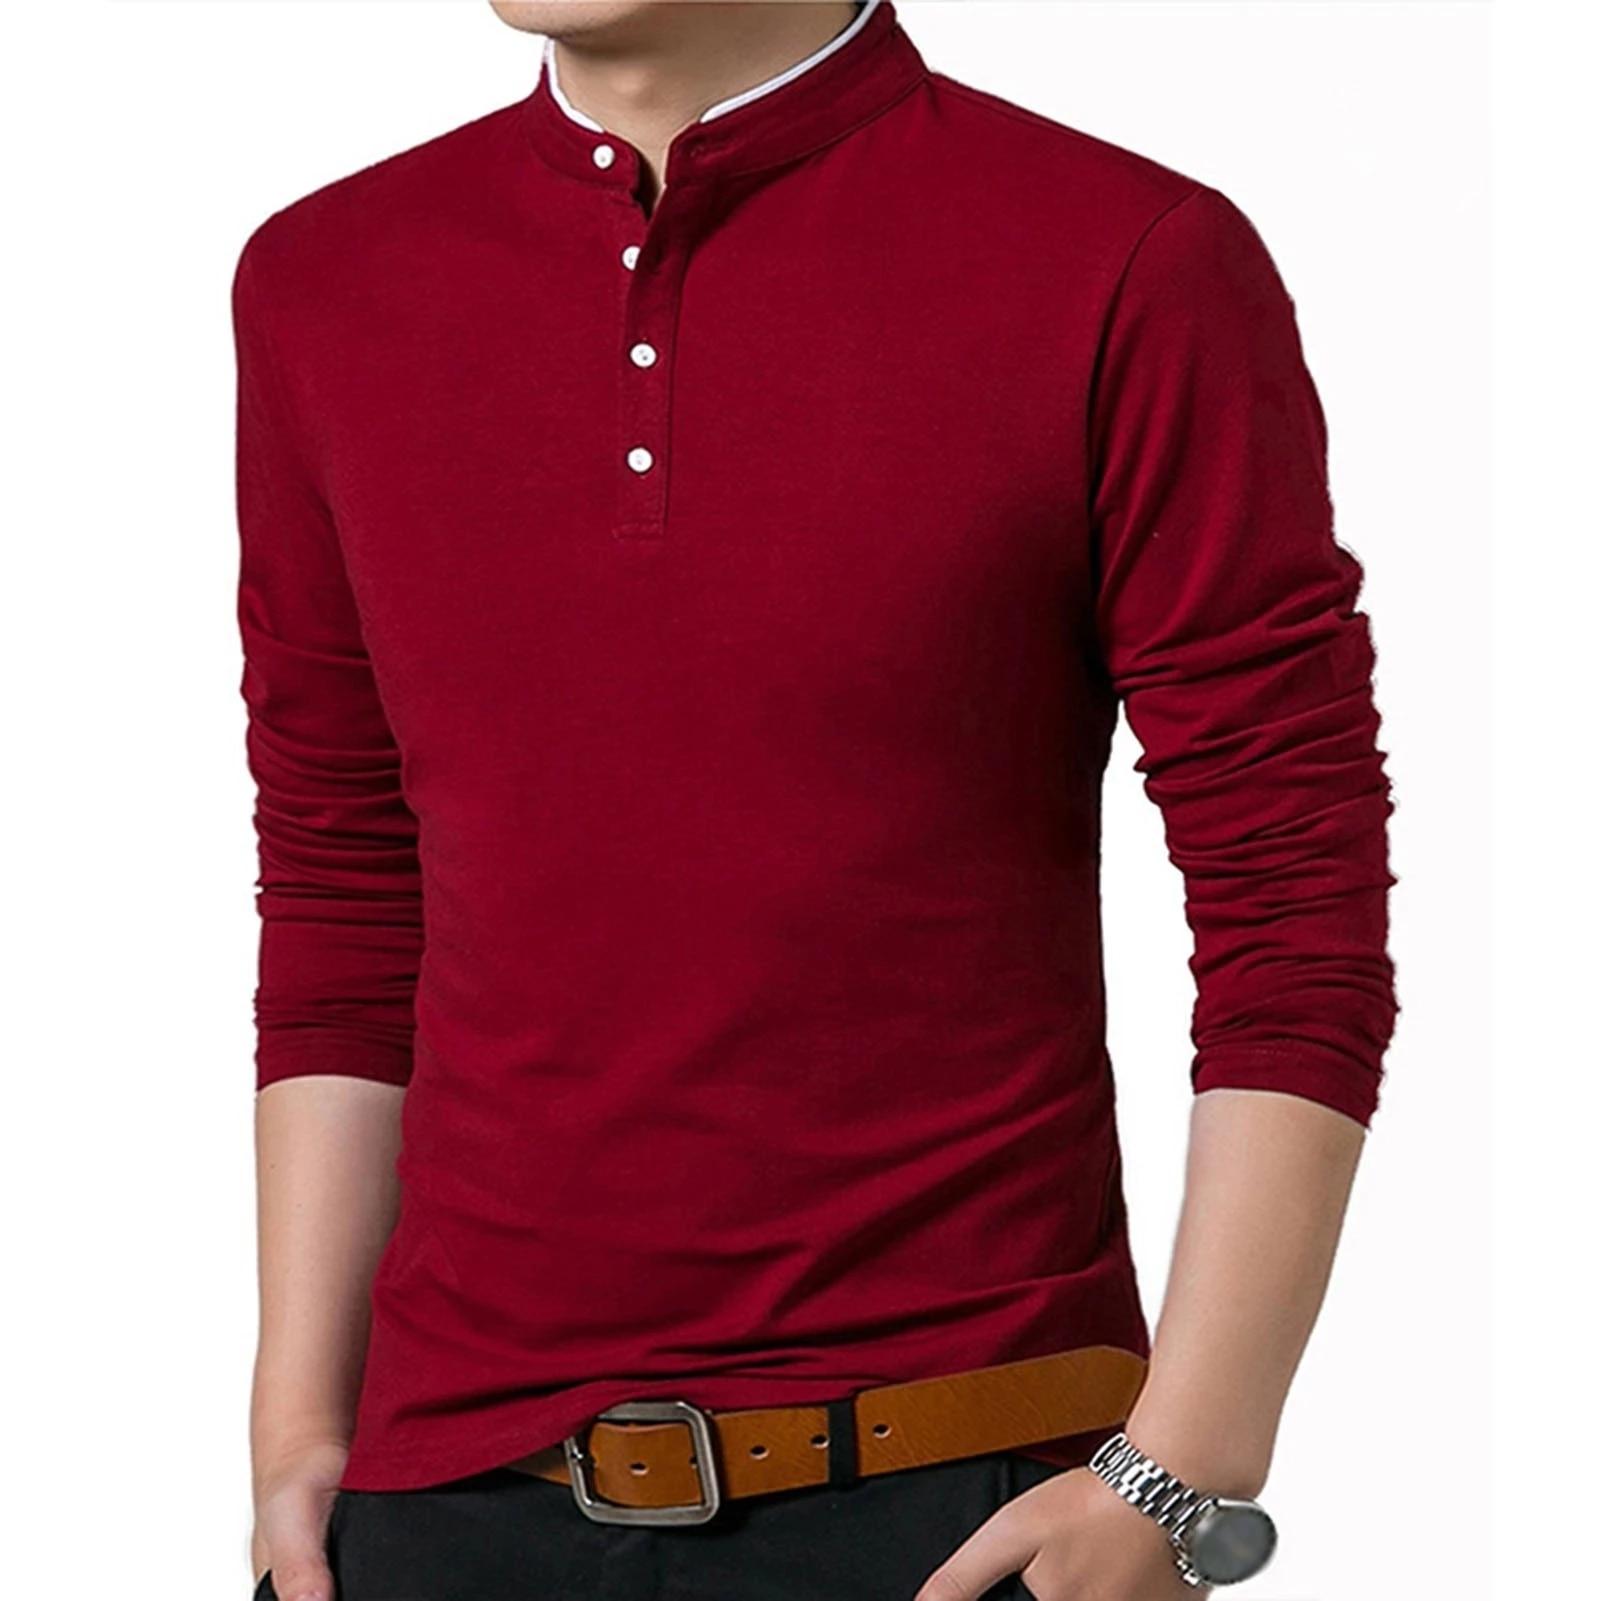 Camiseta de manga corta para hombre de camiseta personalizada de color sólido...